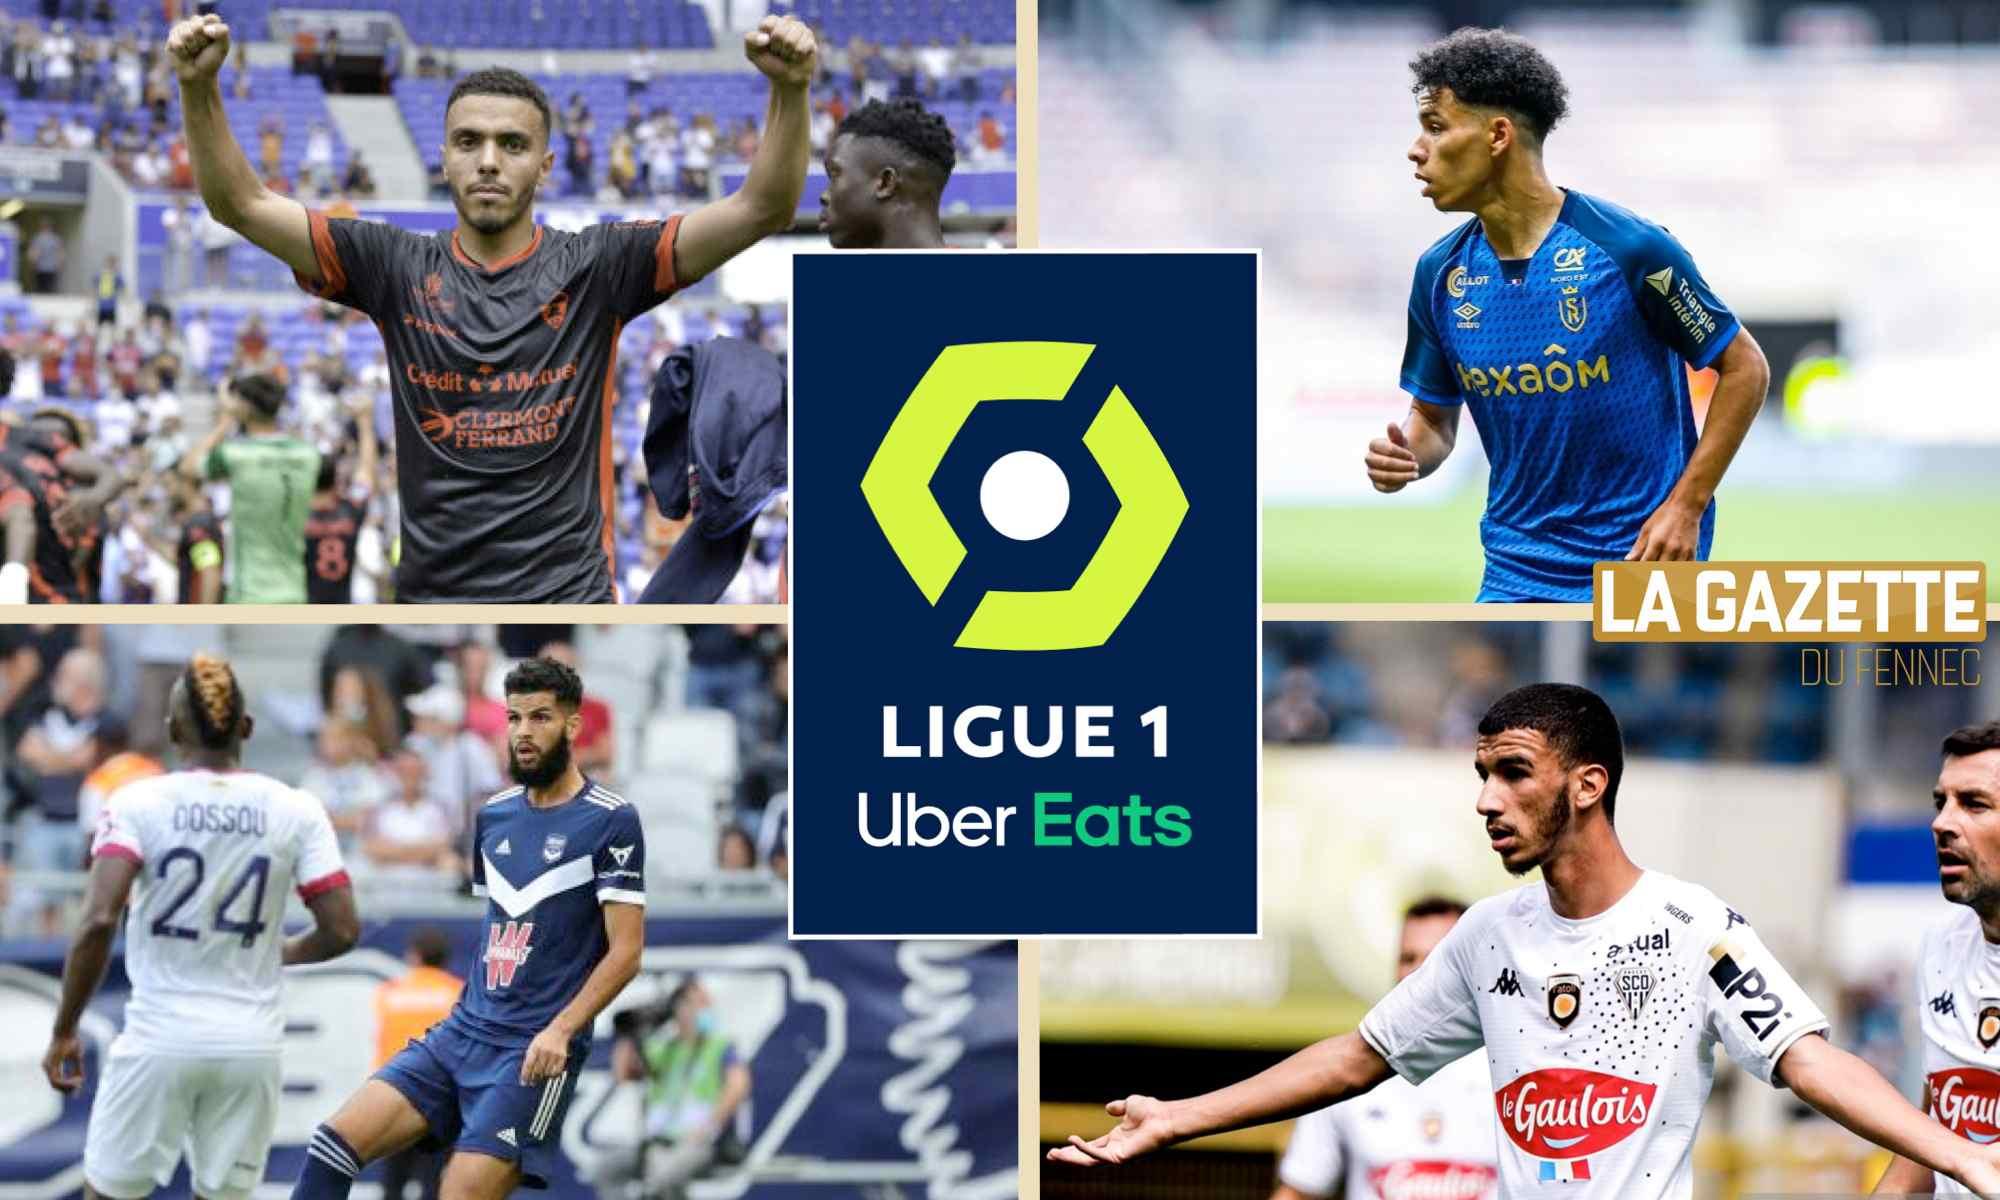 zedadka kebbal medioub taibi debut ligue 1 decouverte nouveaux